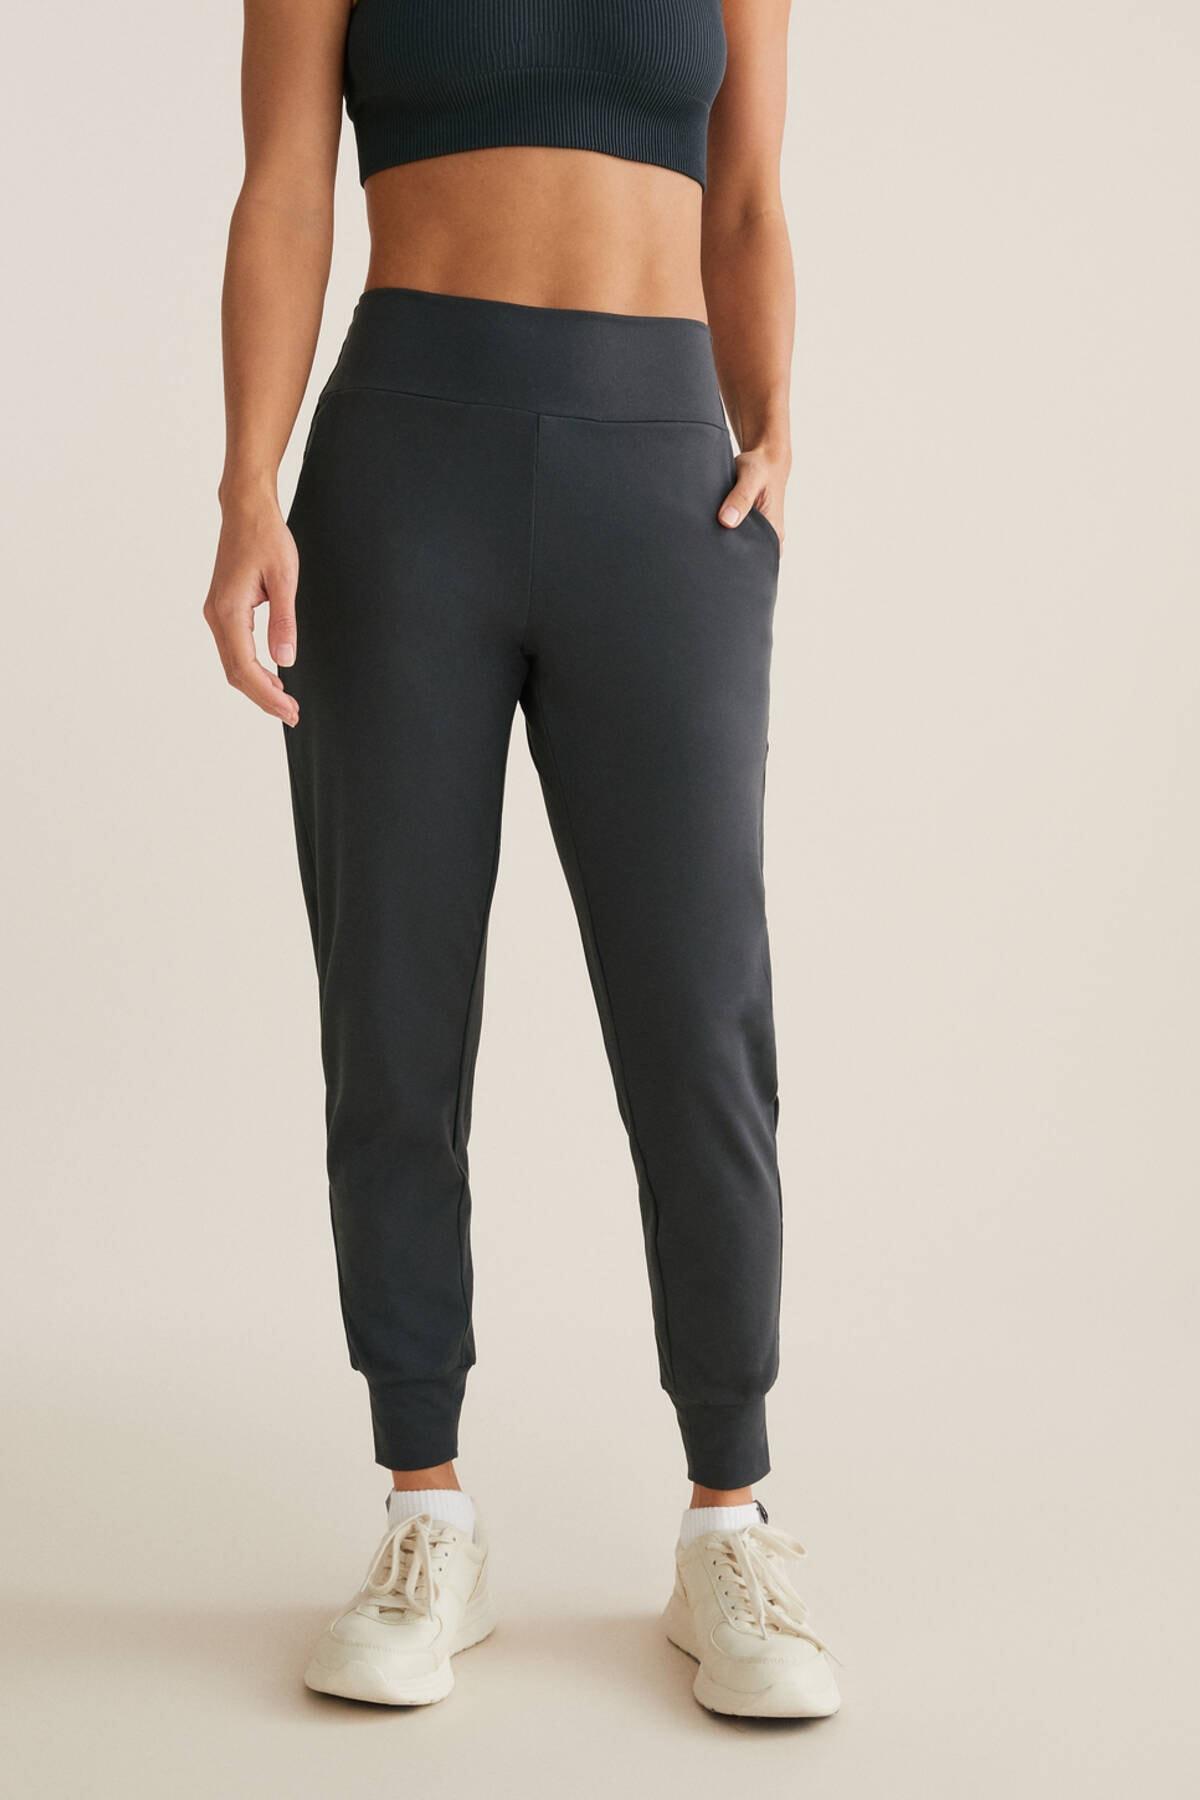 Oysho Kadın Gri Comfort Jogger Pantolon 1